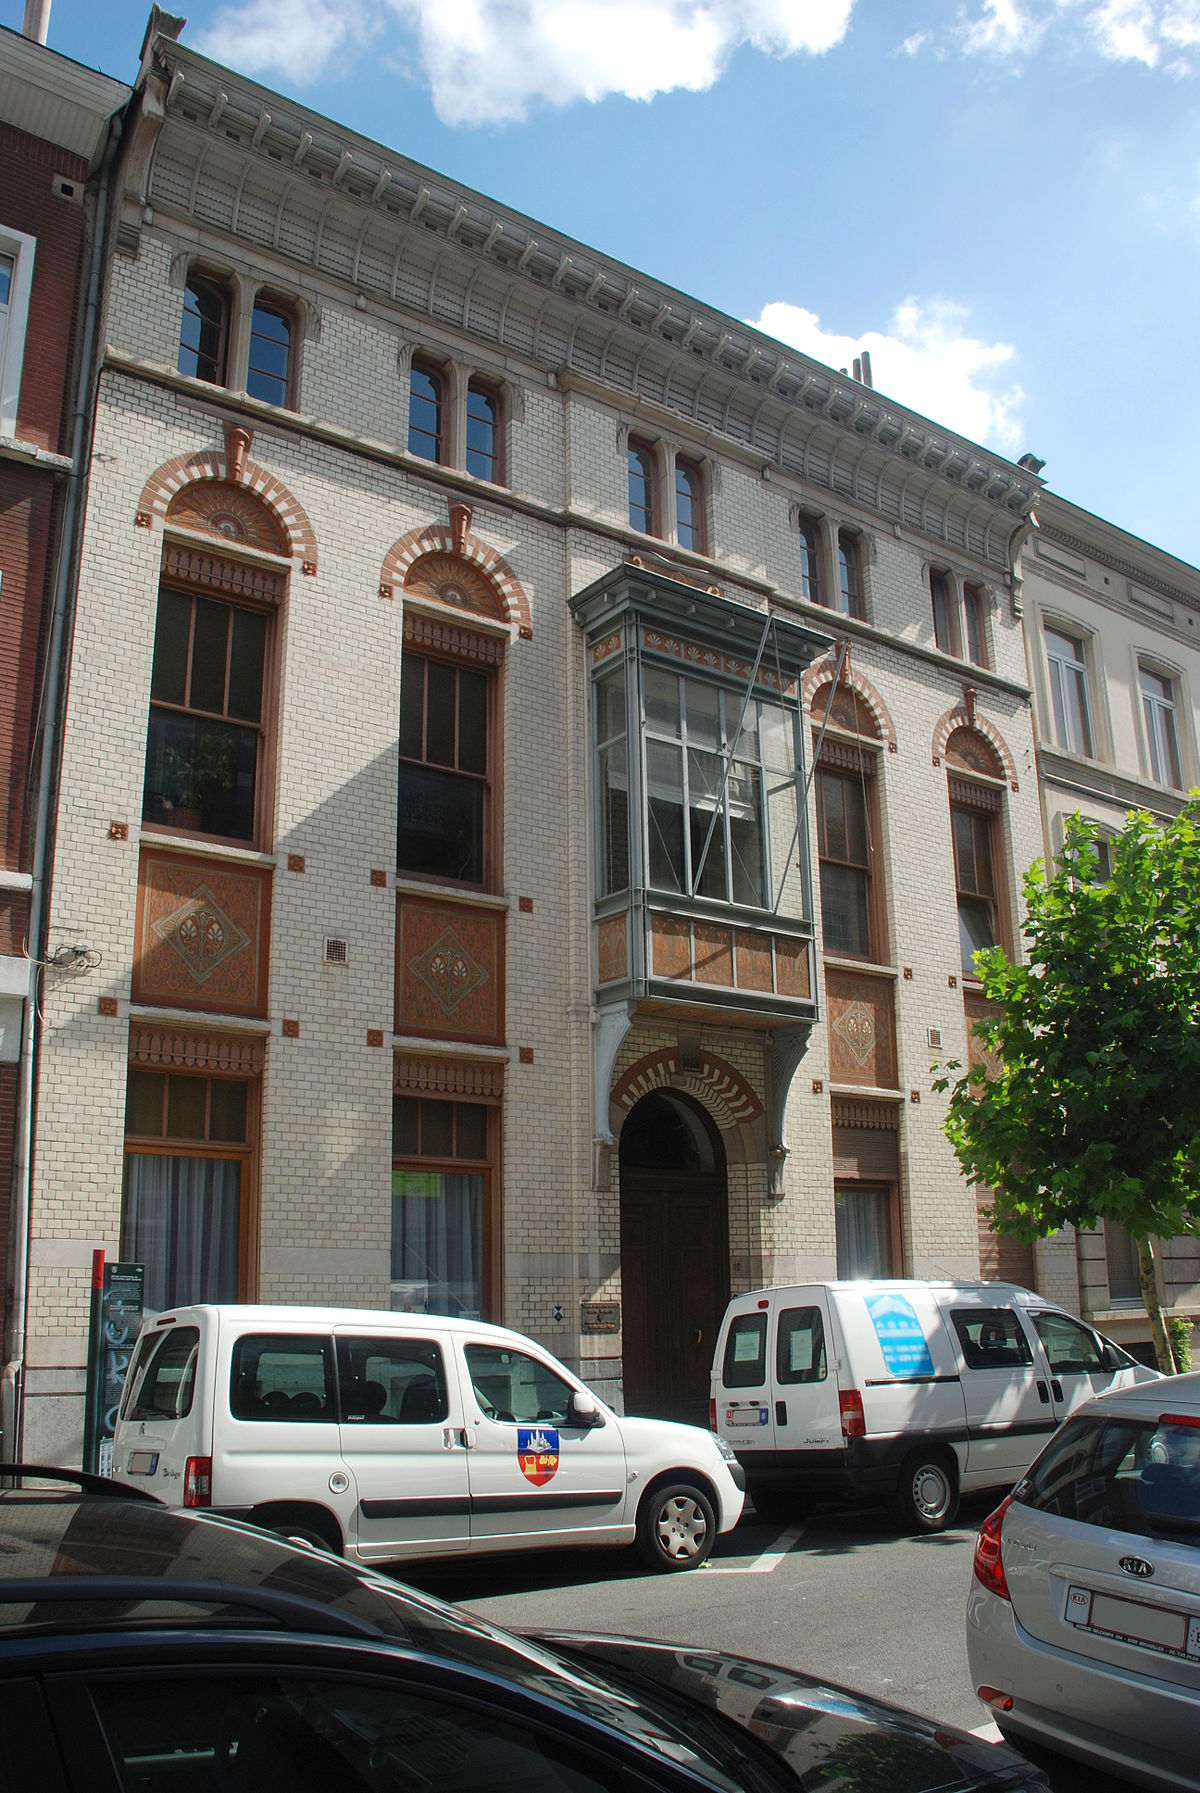 Maison govaerts wikip dia for A la maison meaning